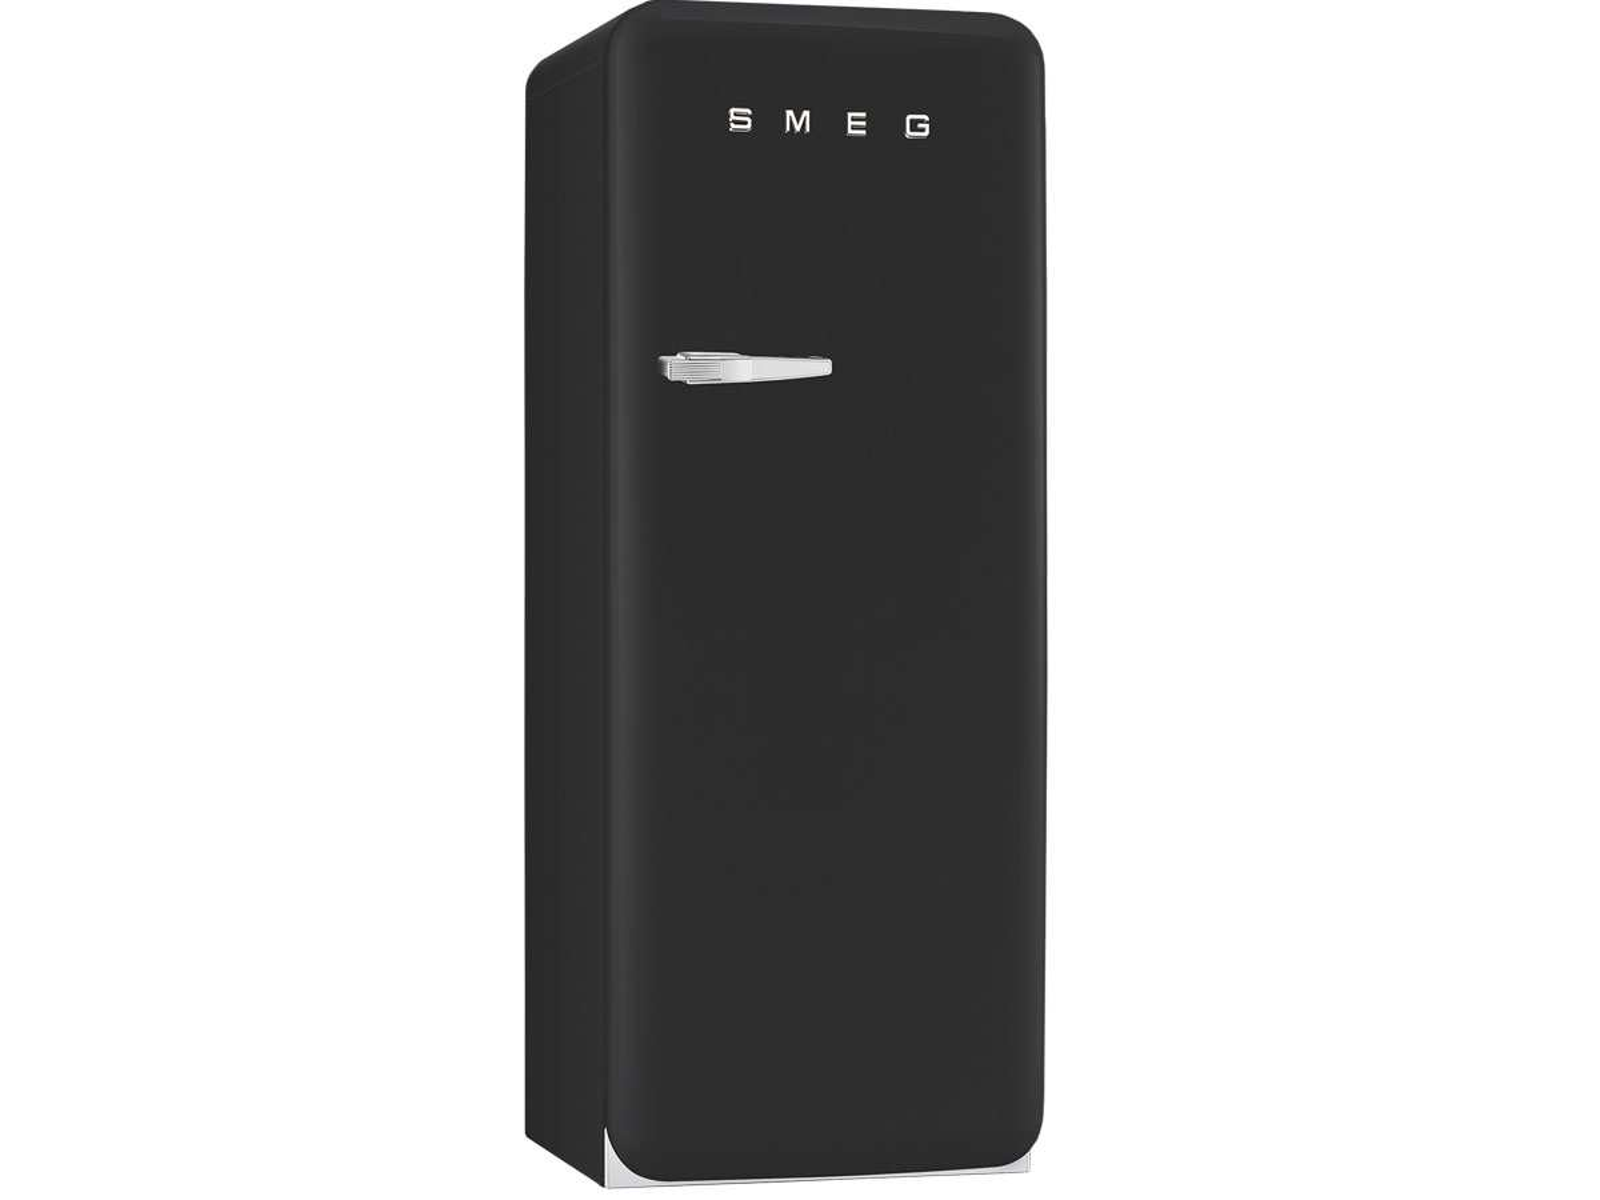 Smeg Kühlschrank Licht : Smeg kühl gefrierkombination fab lpn creme linksanschlag a no